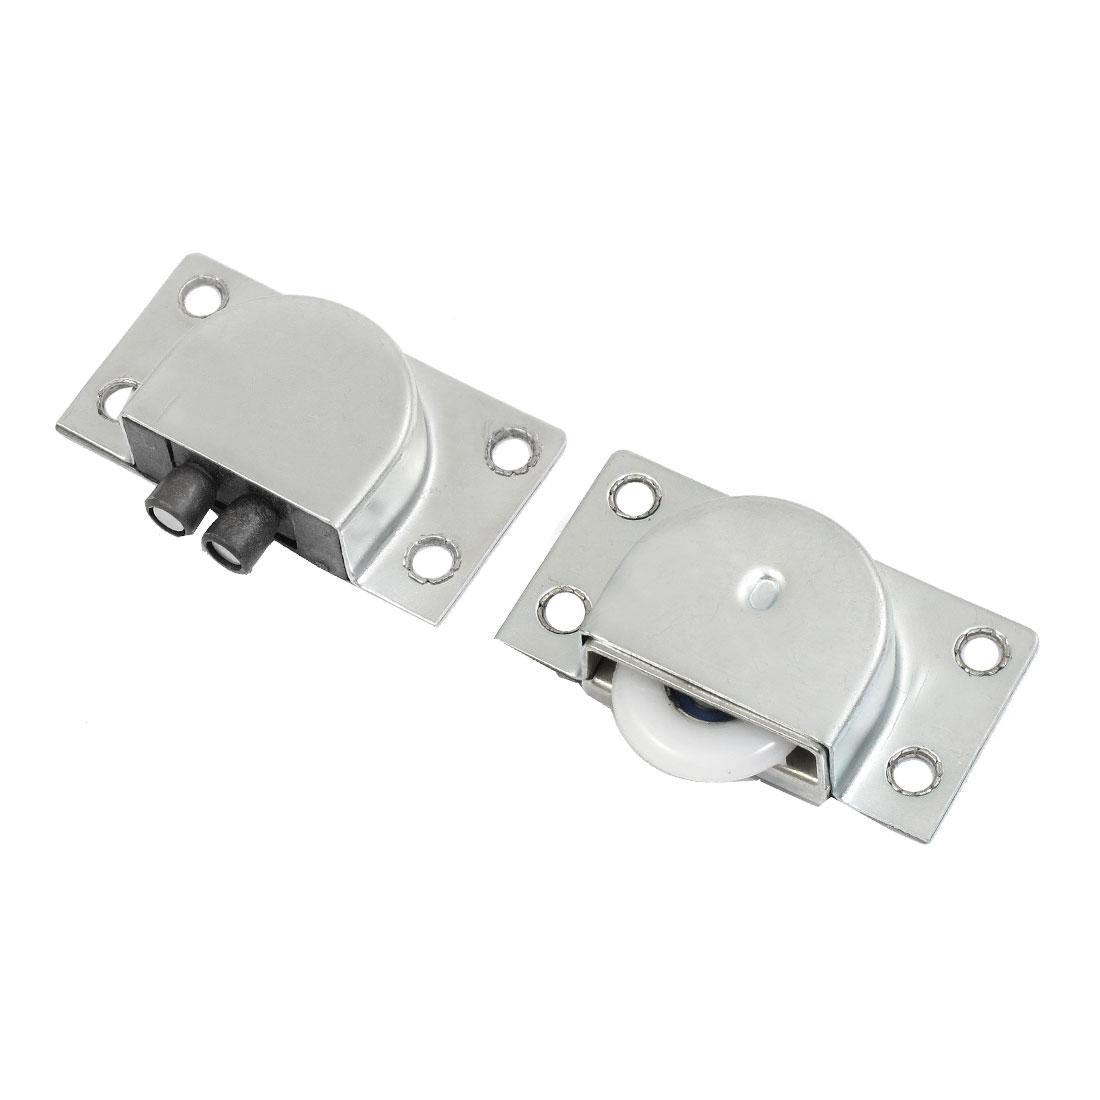 2 Pcs Silver Tone Metal Plate Home Wardrobe Sliding Door Roller Set